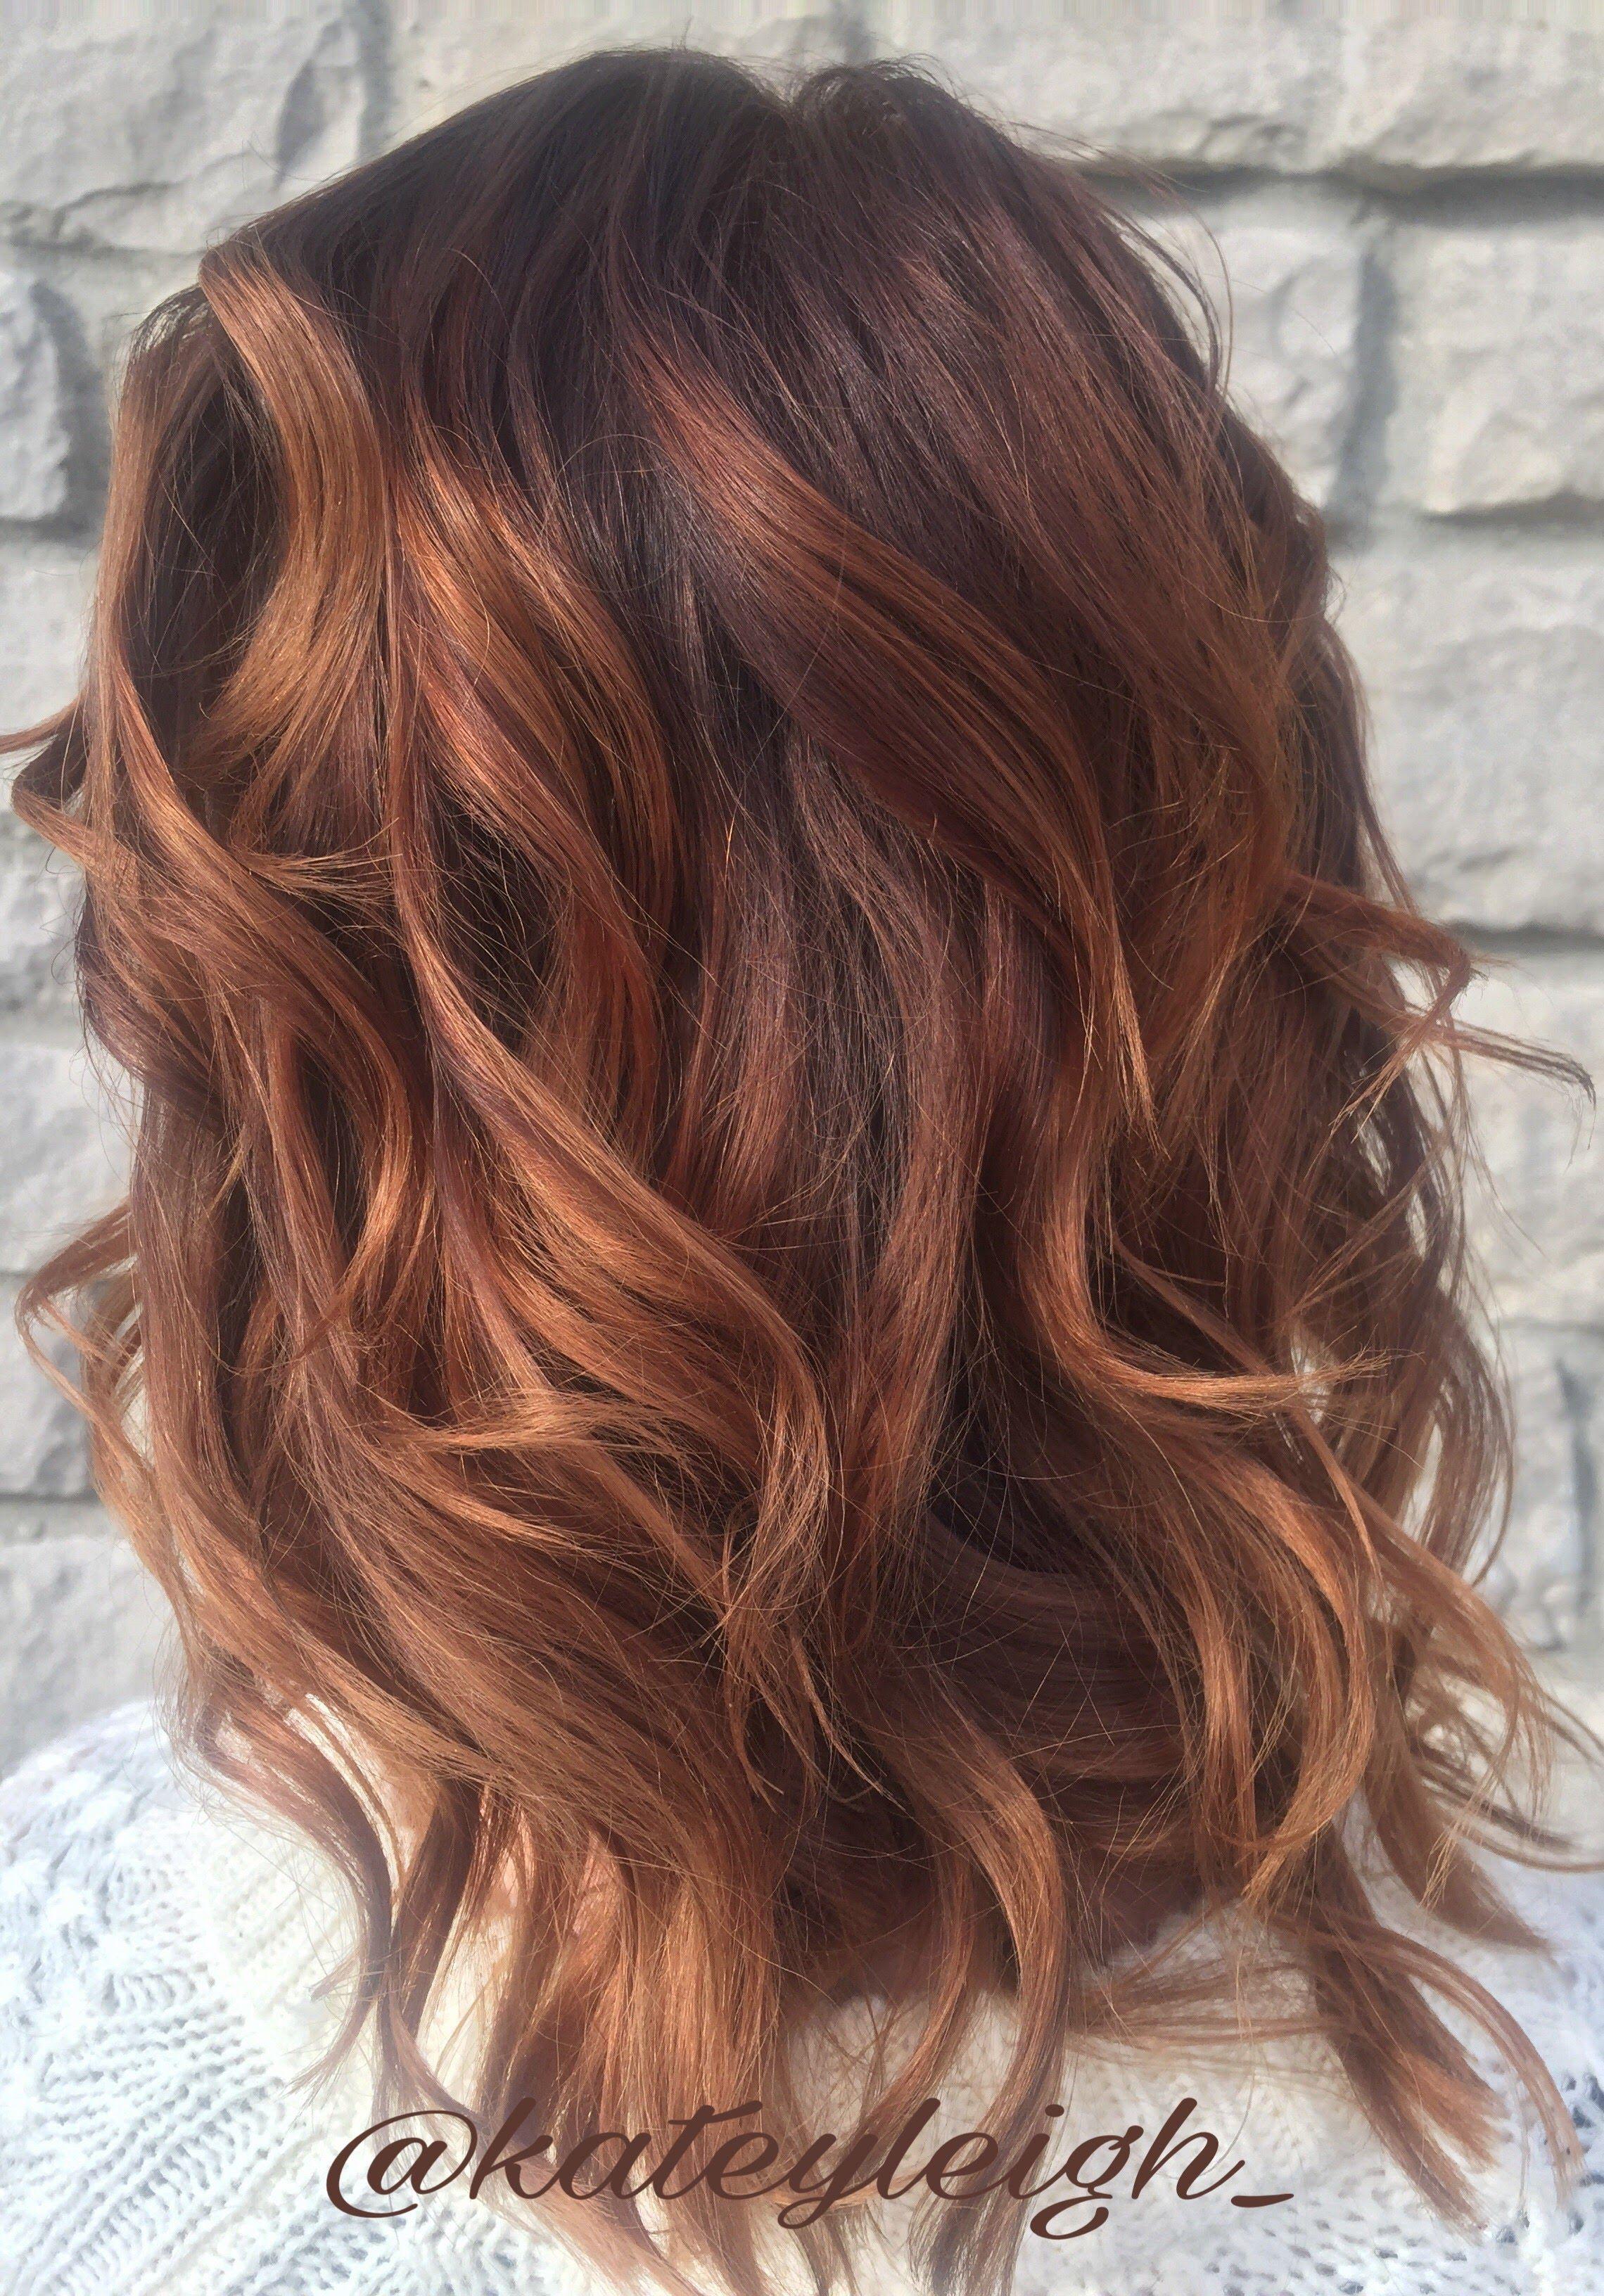 Rose gold balayage on a base of red hair using pravana chromasilk rose gold balayage on a base of red hair using pravana chromasilk hair color and pravana nvjuhfo Images